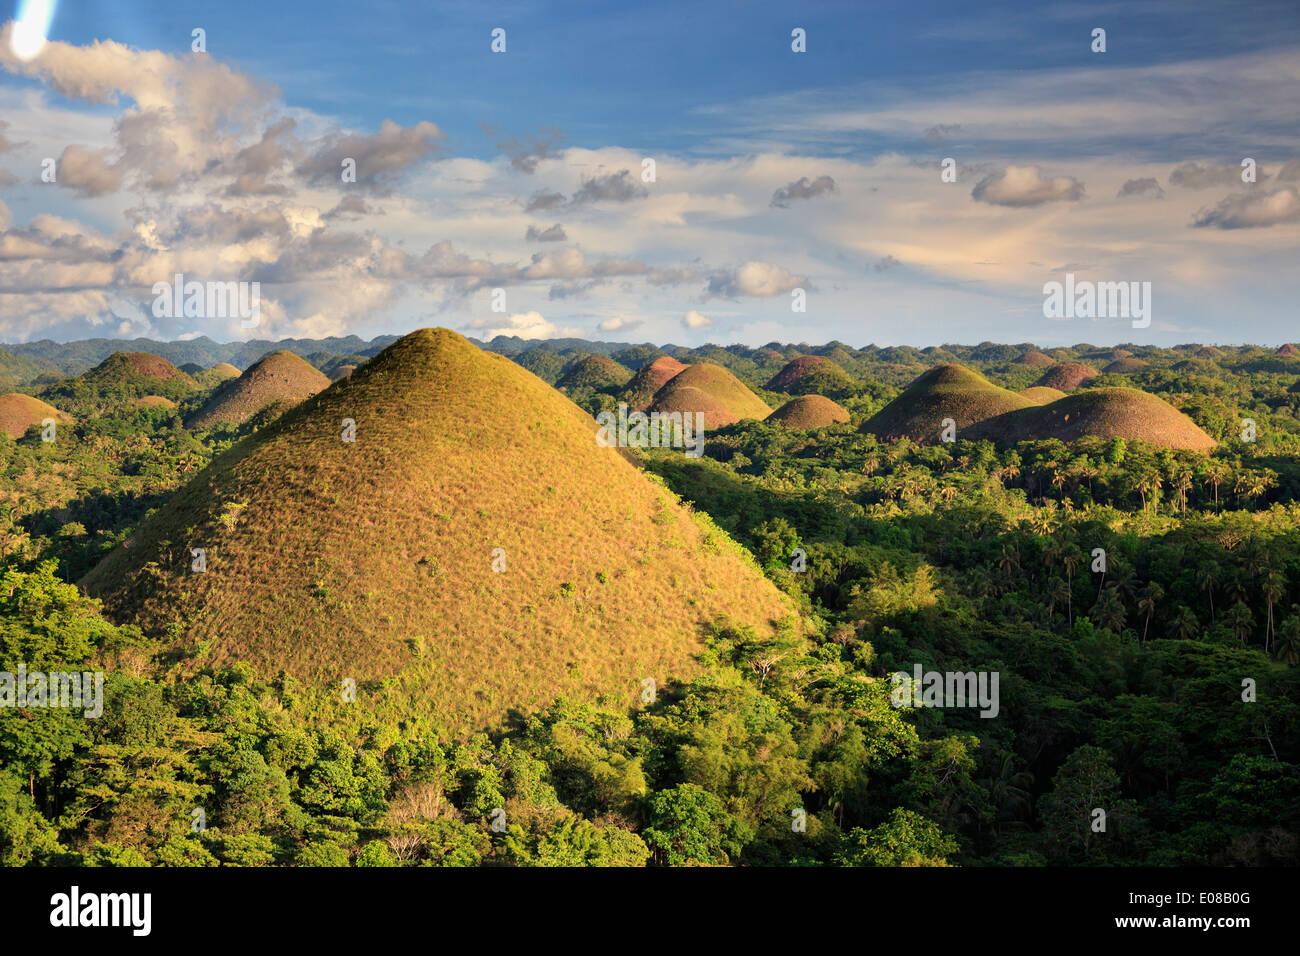 Philippines, Bohol, Chocolate Hills - Stock Image